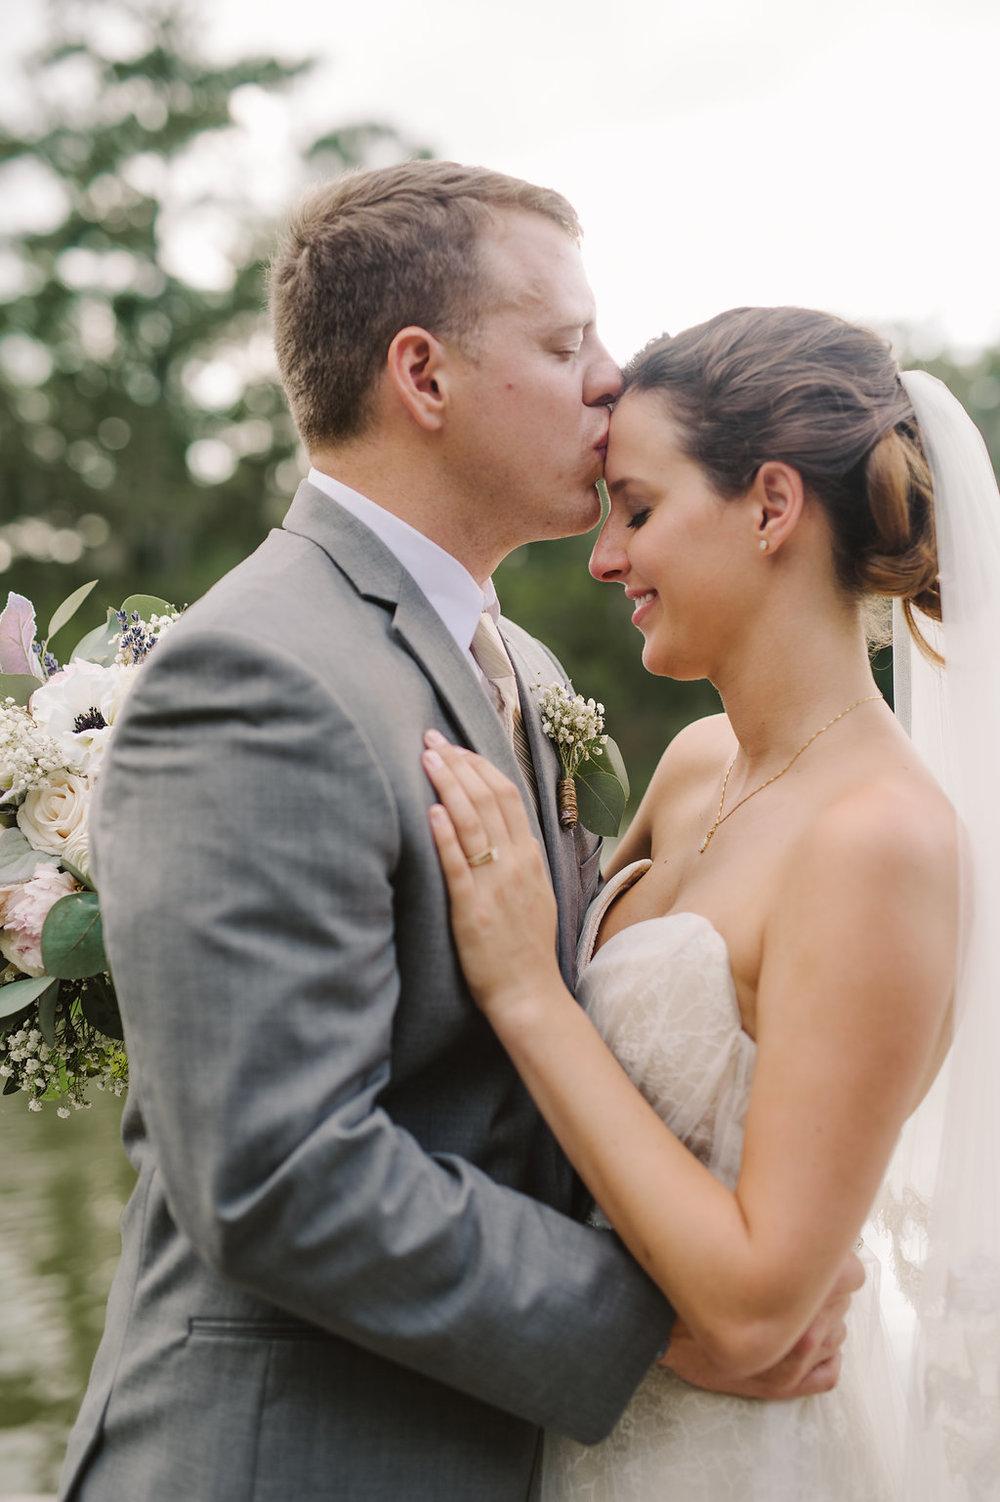 meagan-and-brenden-rach-loves-troy-photography-ivory-and-beau-bridal-boutqiue-ti-adora-wedding-dress-gold-lace-wedding-dress-savannah-wedding-planner-savannah-weddings-oldfield-plantation-wedding-savannah-florist-24.jpg